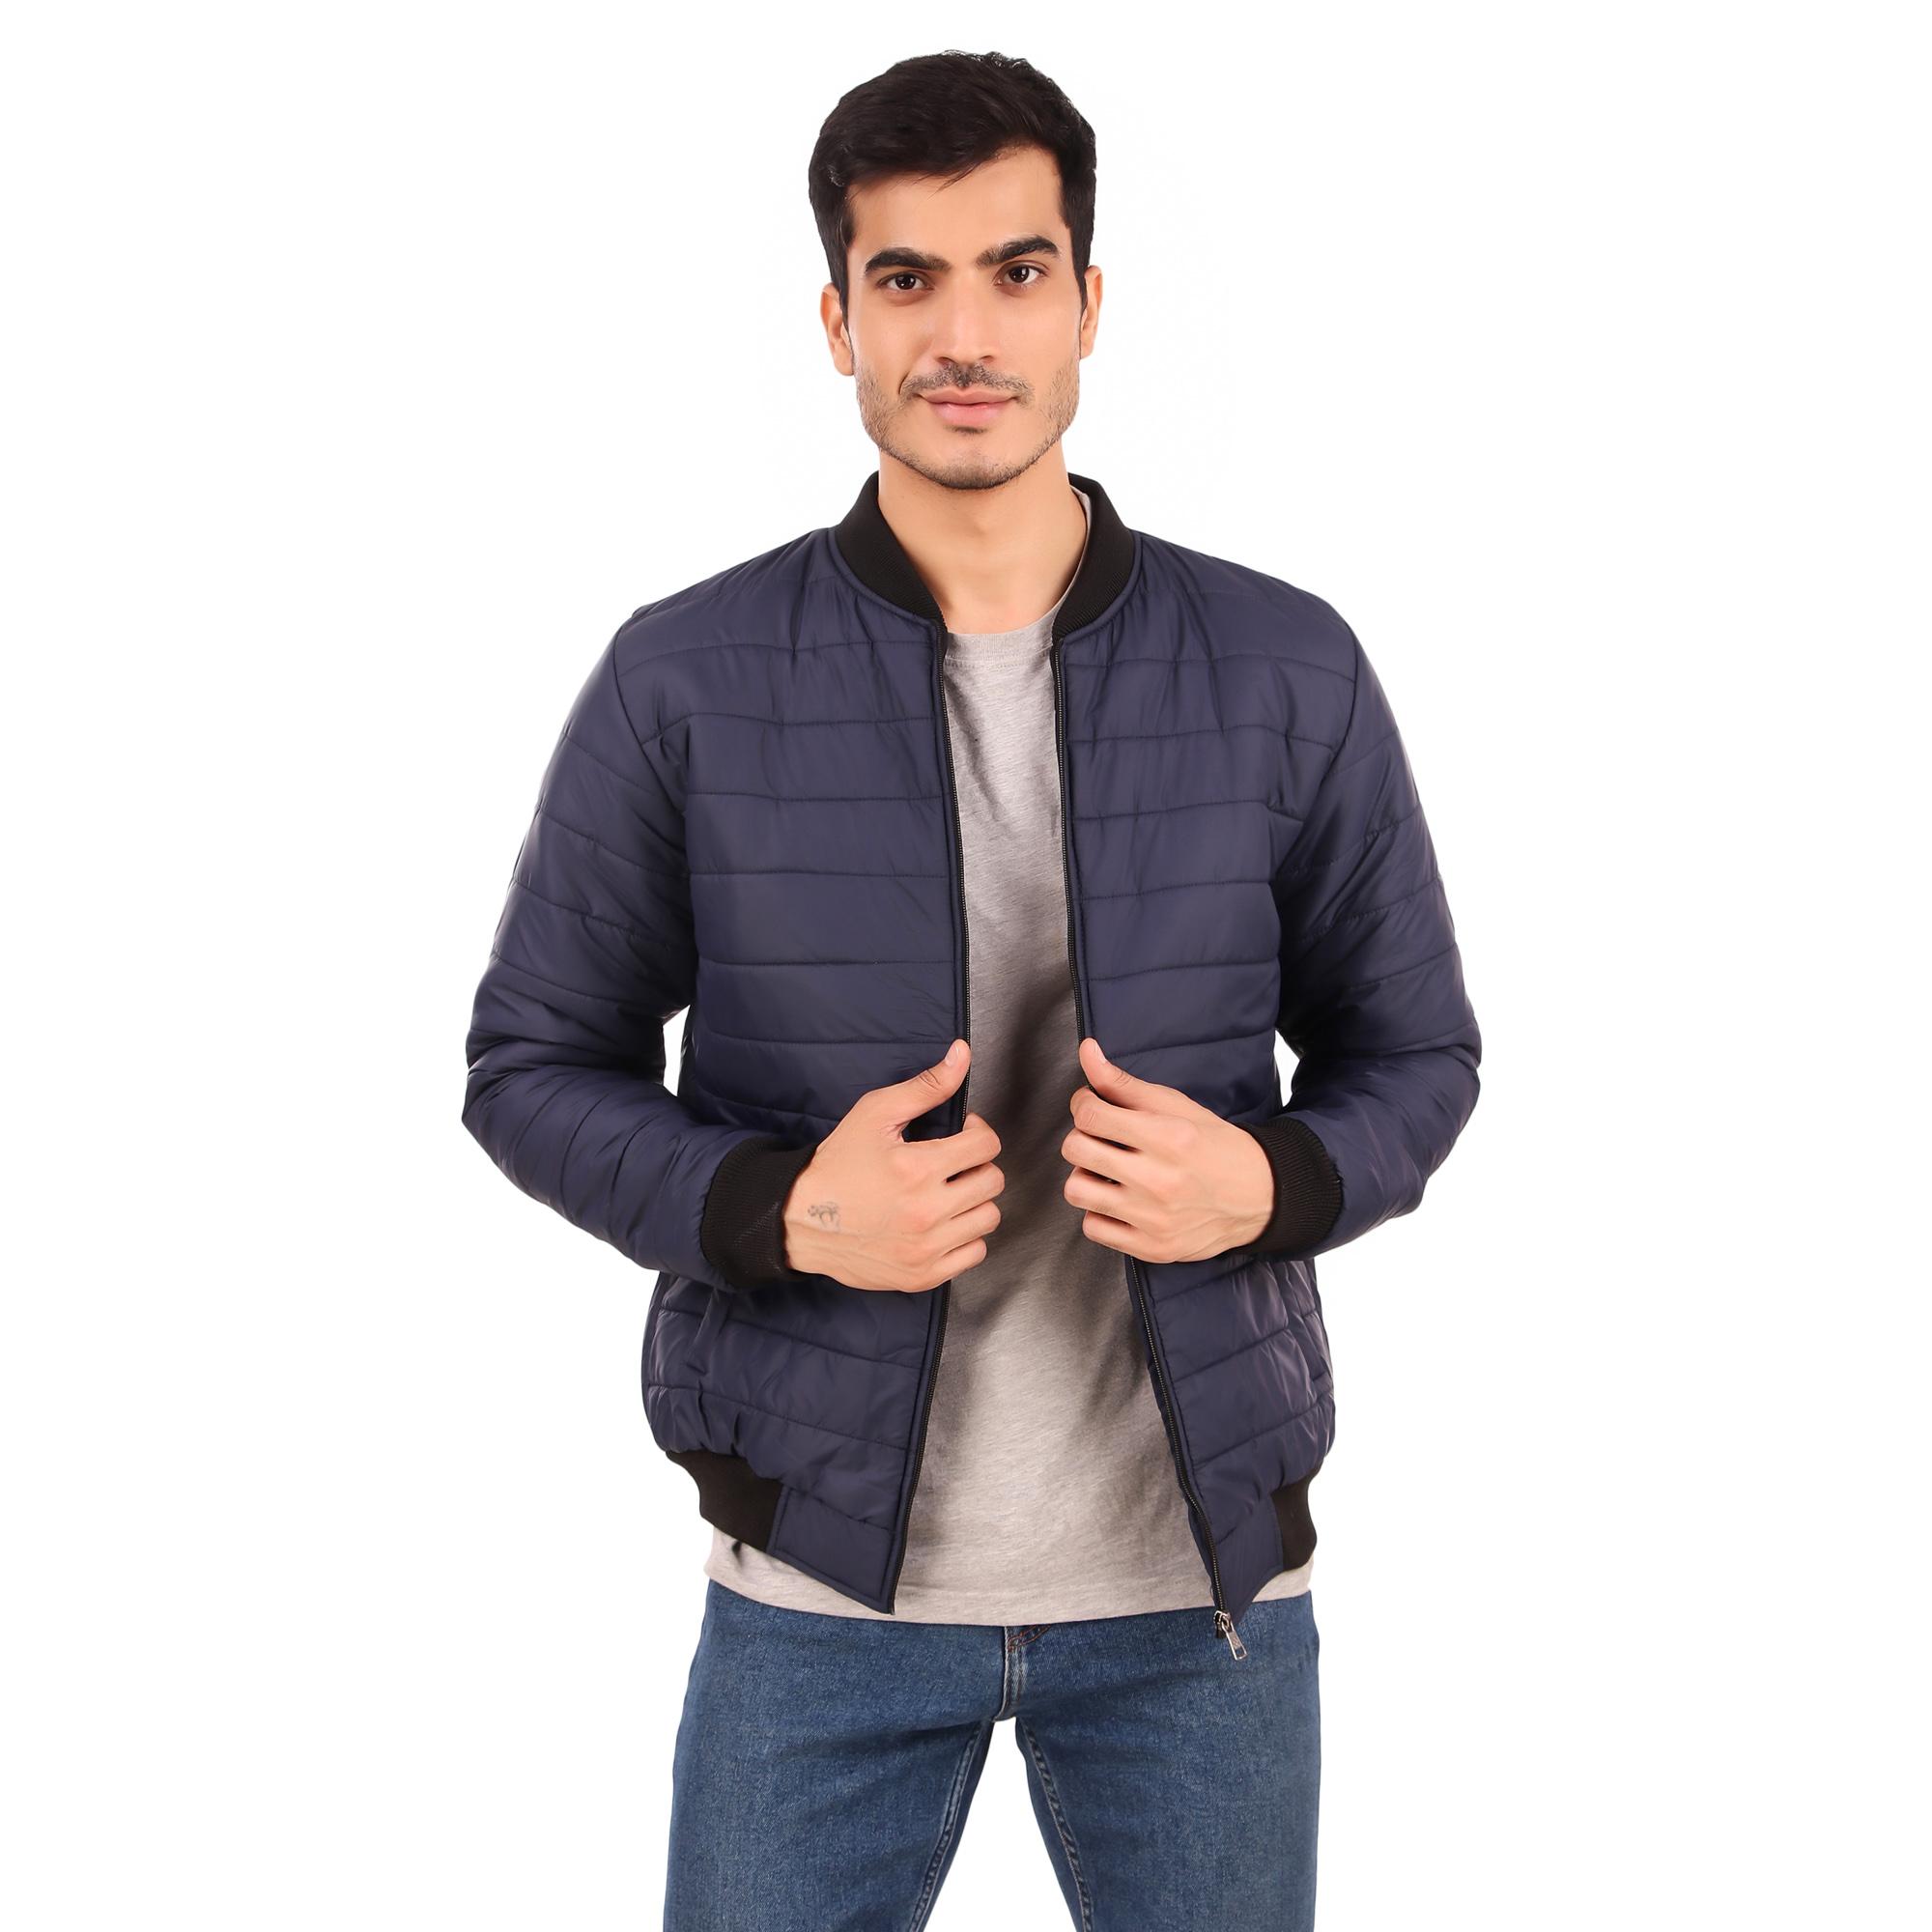 Full Sleeve Solid Men Jacket Polyester Regular Fit Jacket